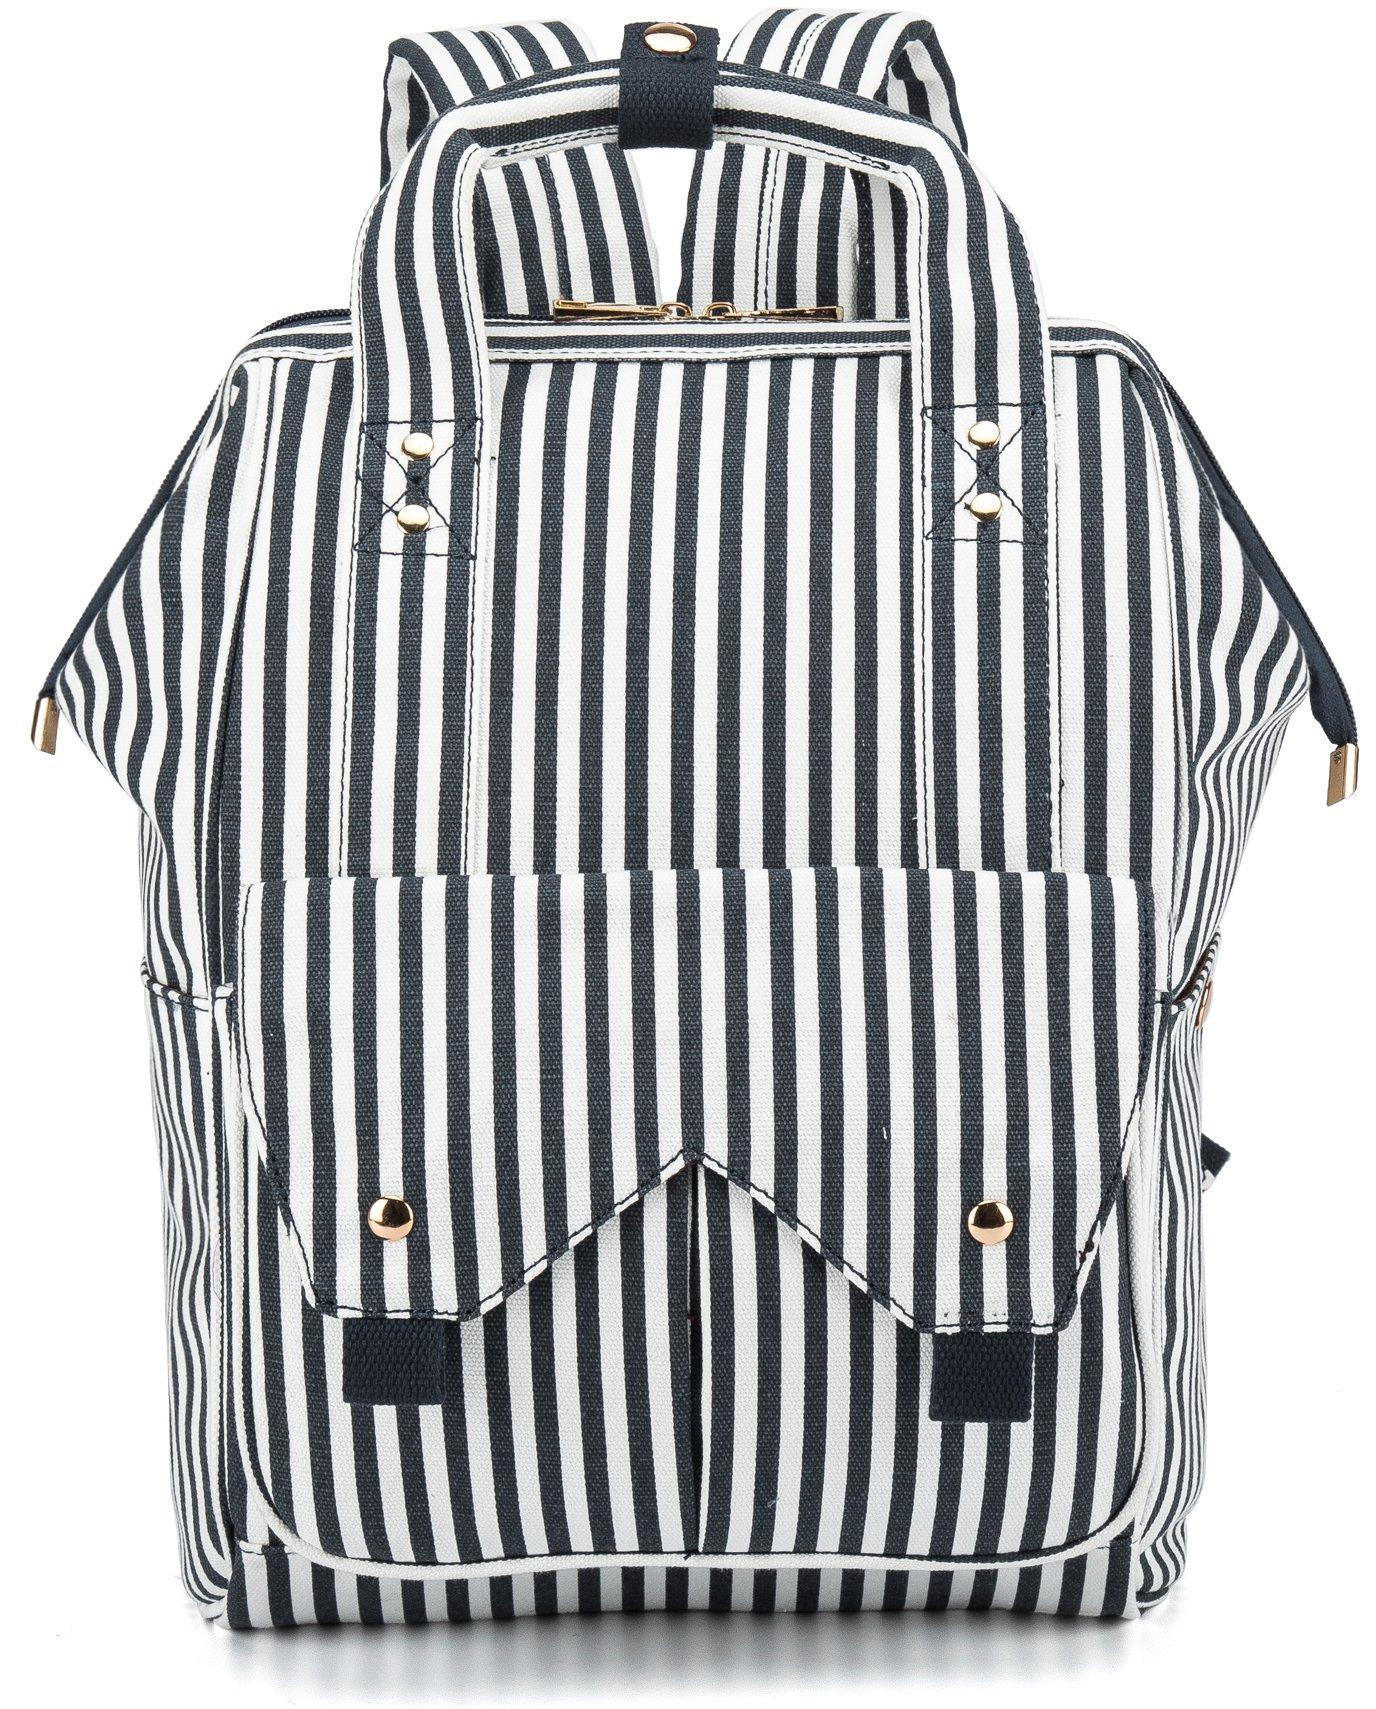 Womens Backpack Doctor Style Diaper Bag Multipurpose College School Laptop Backpacks Bookbag Canvas Rucksack Travel Daypack for Ladies Girls (Blue Stripe)